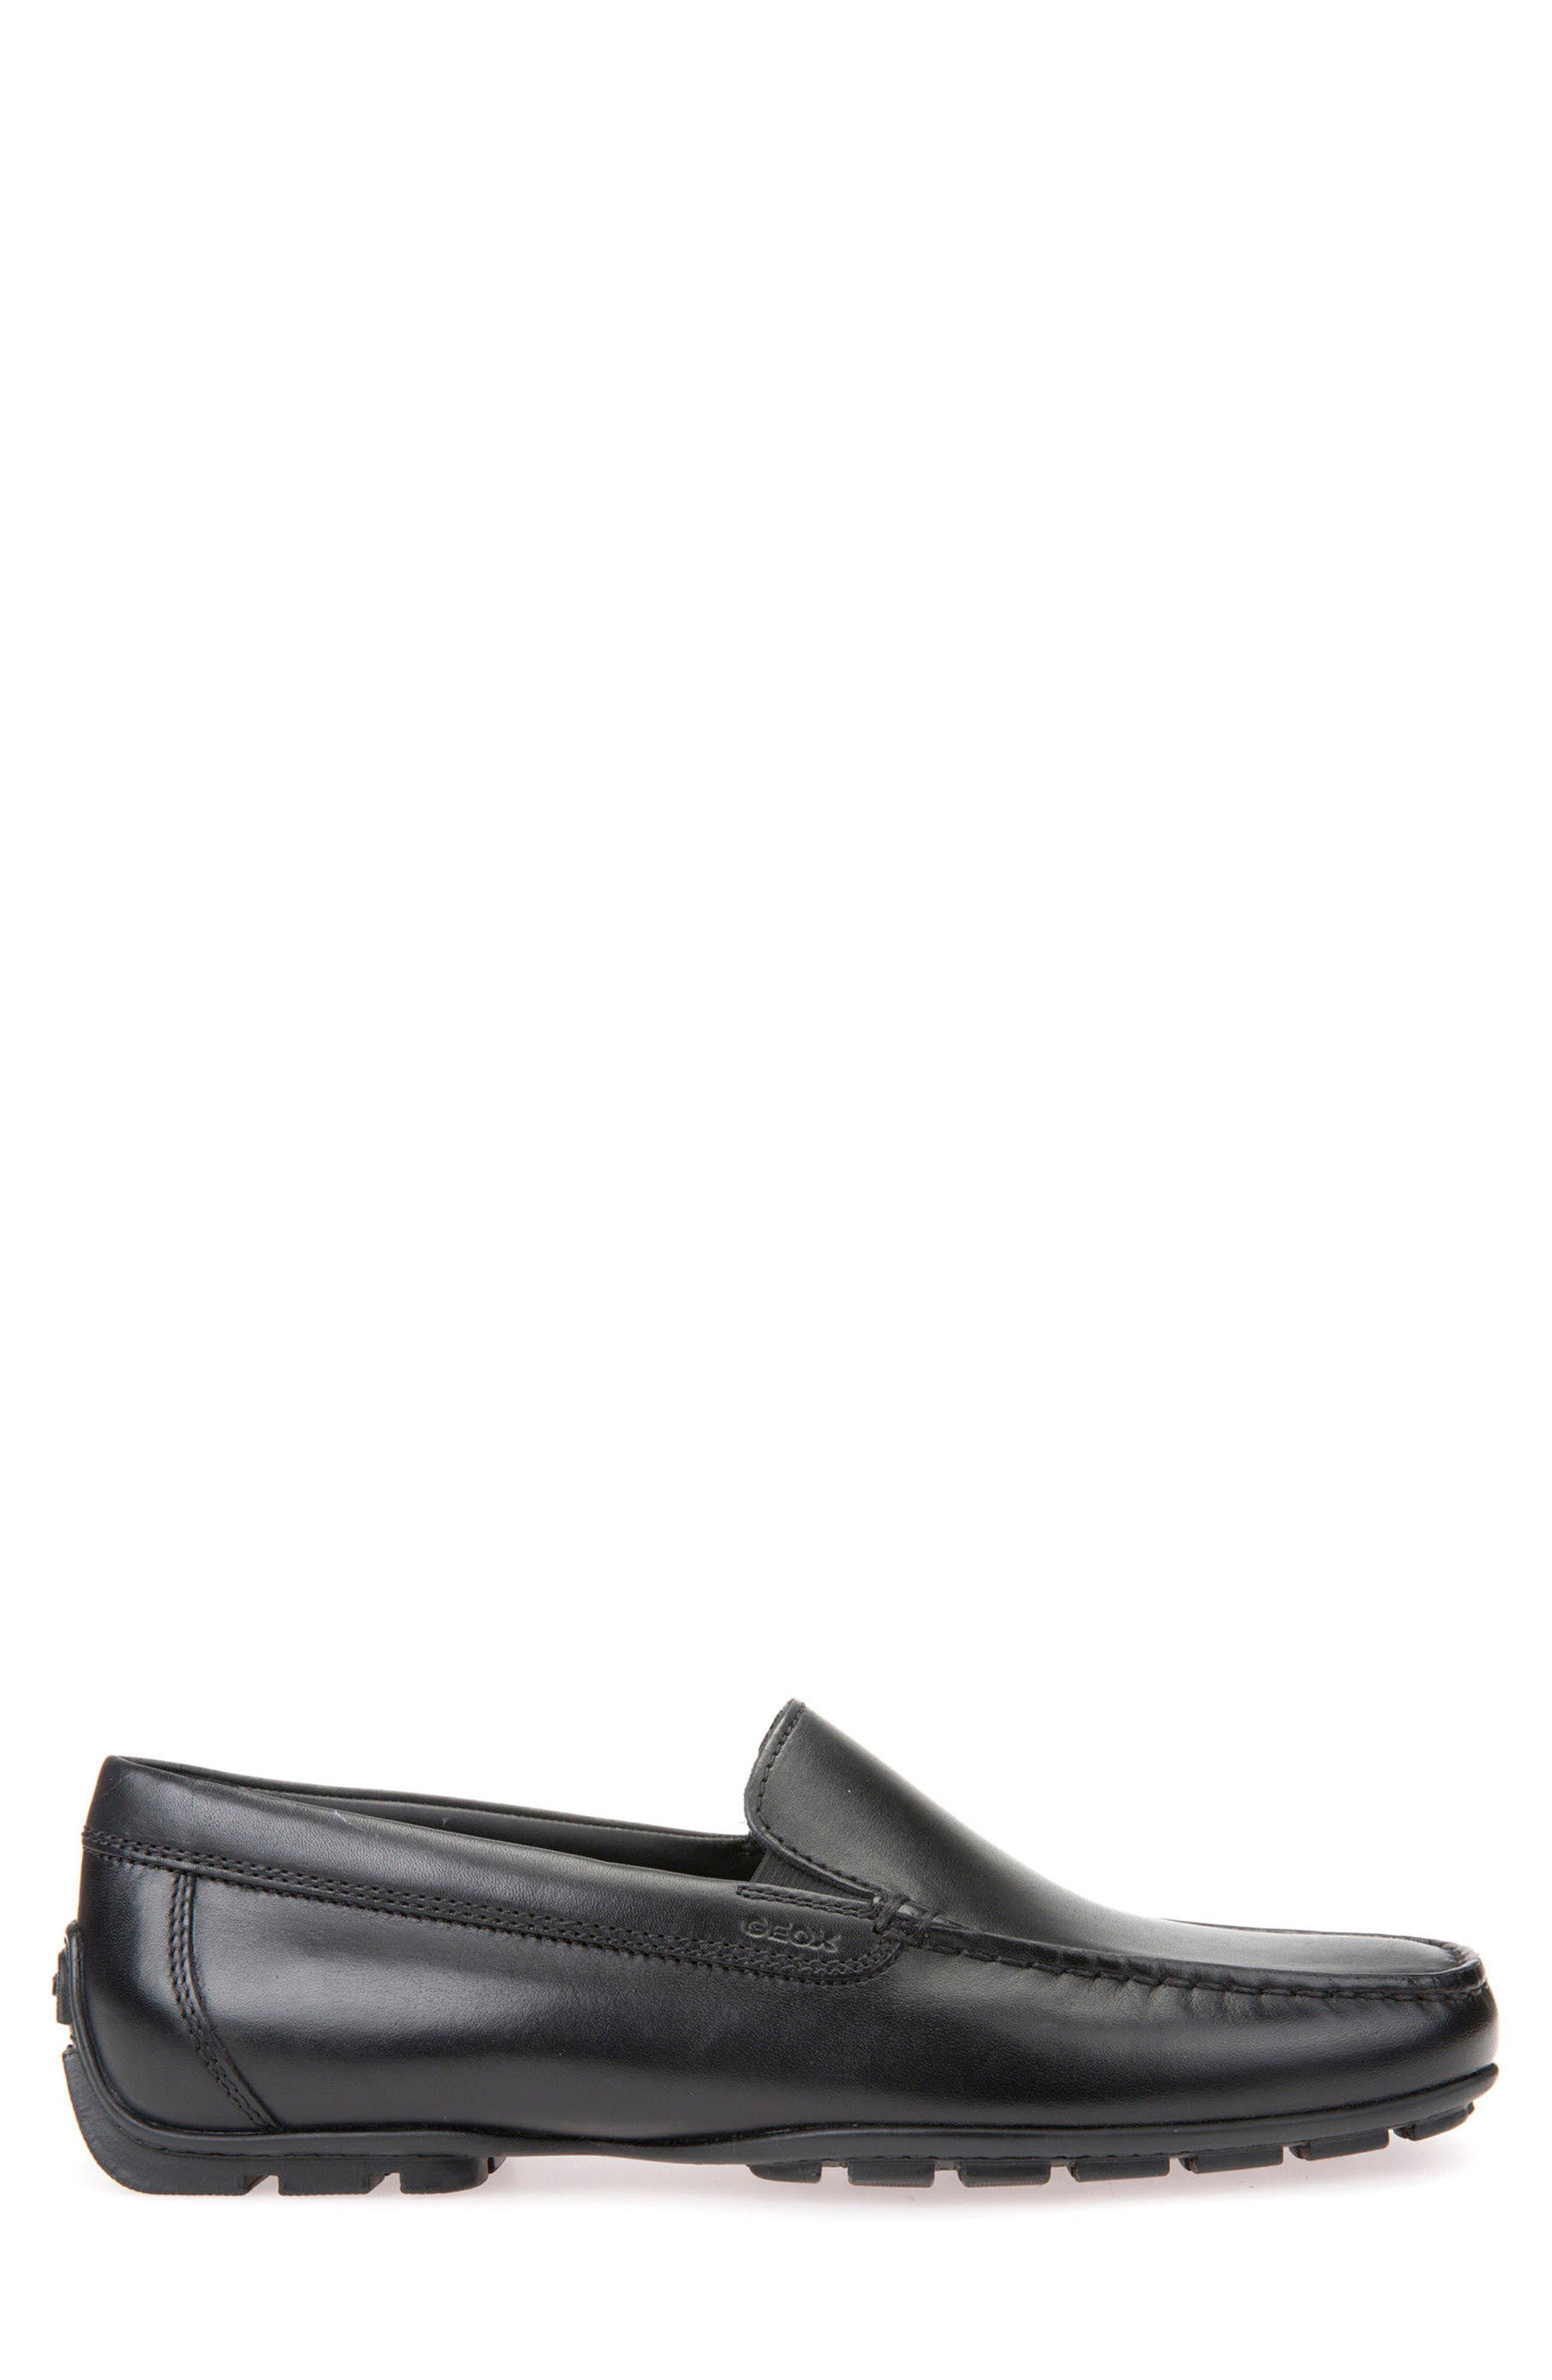 Moner 2Fit 2 Driving Moccasin,                             Alternate thumbnail 3, color,                             Black Leather